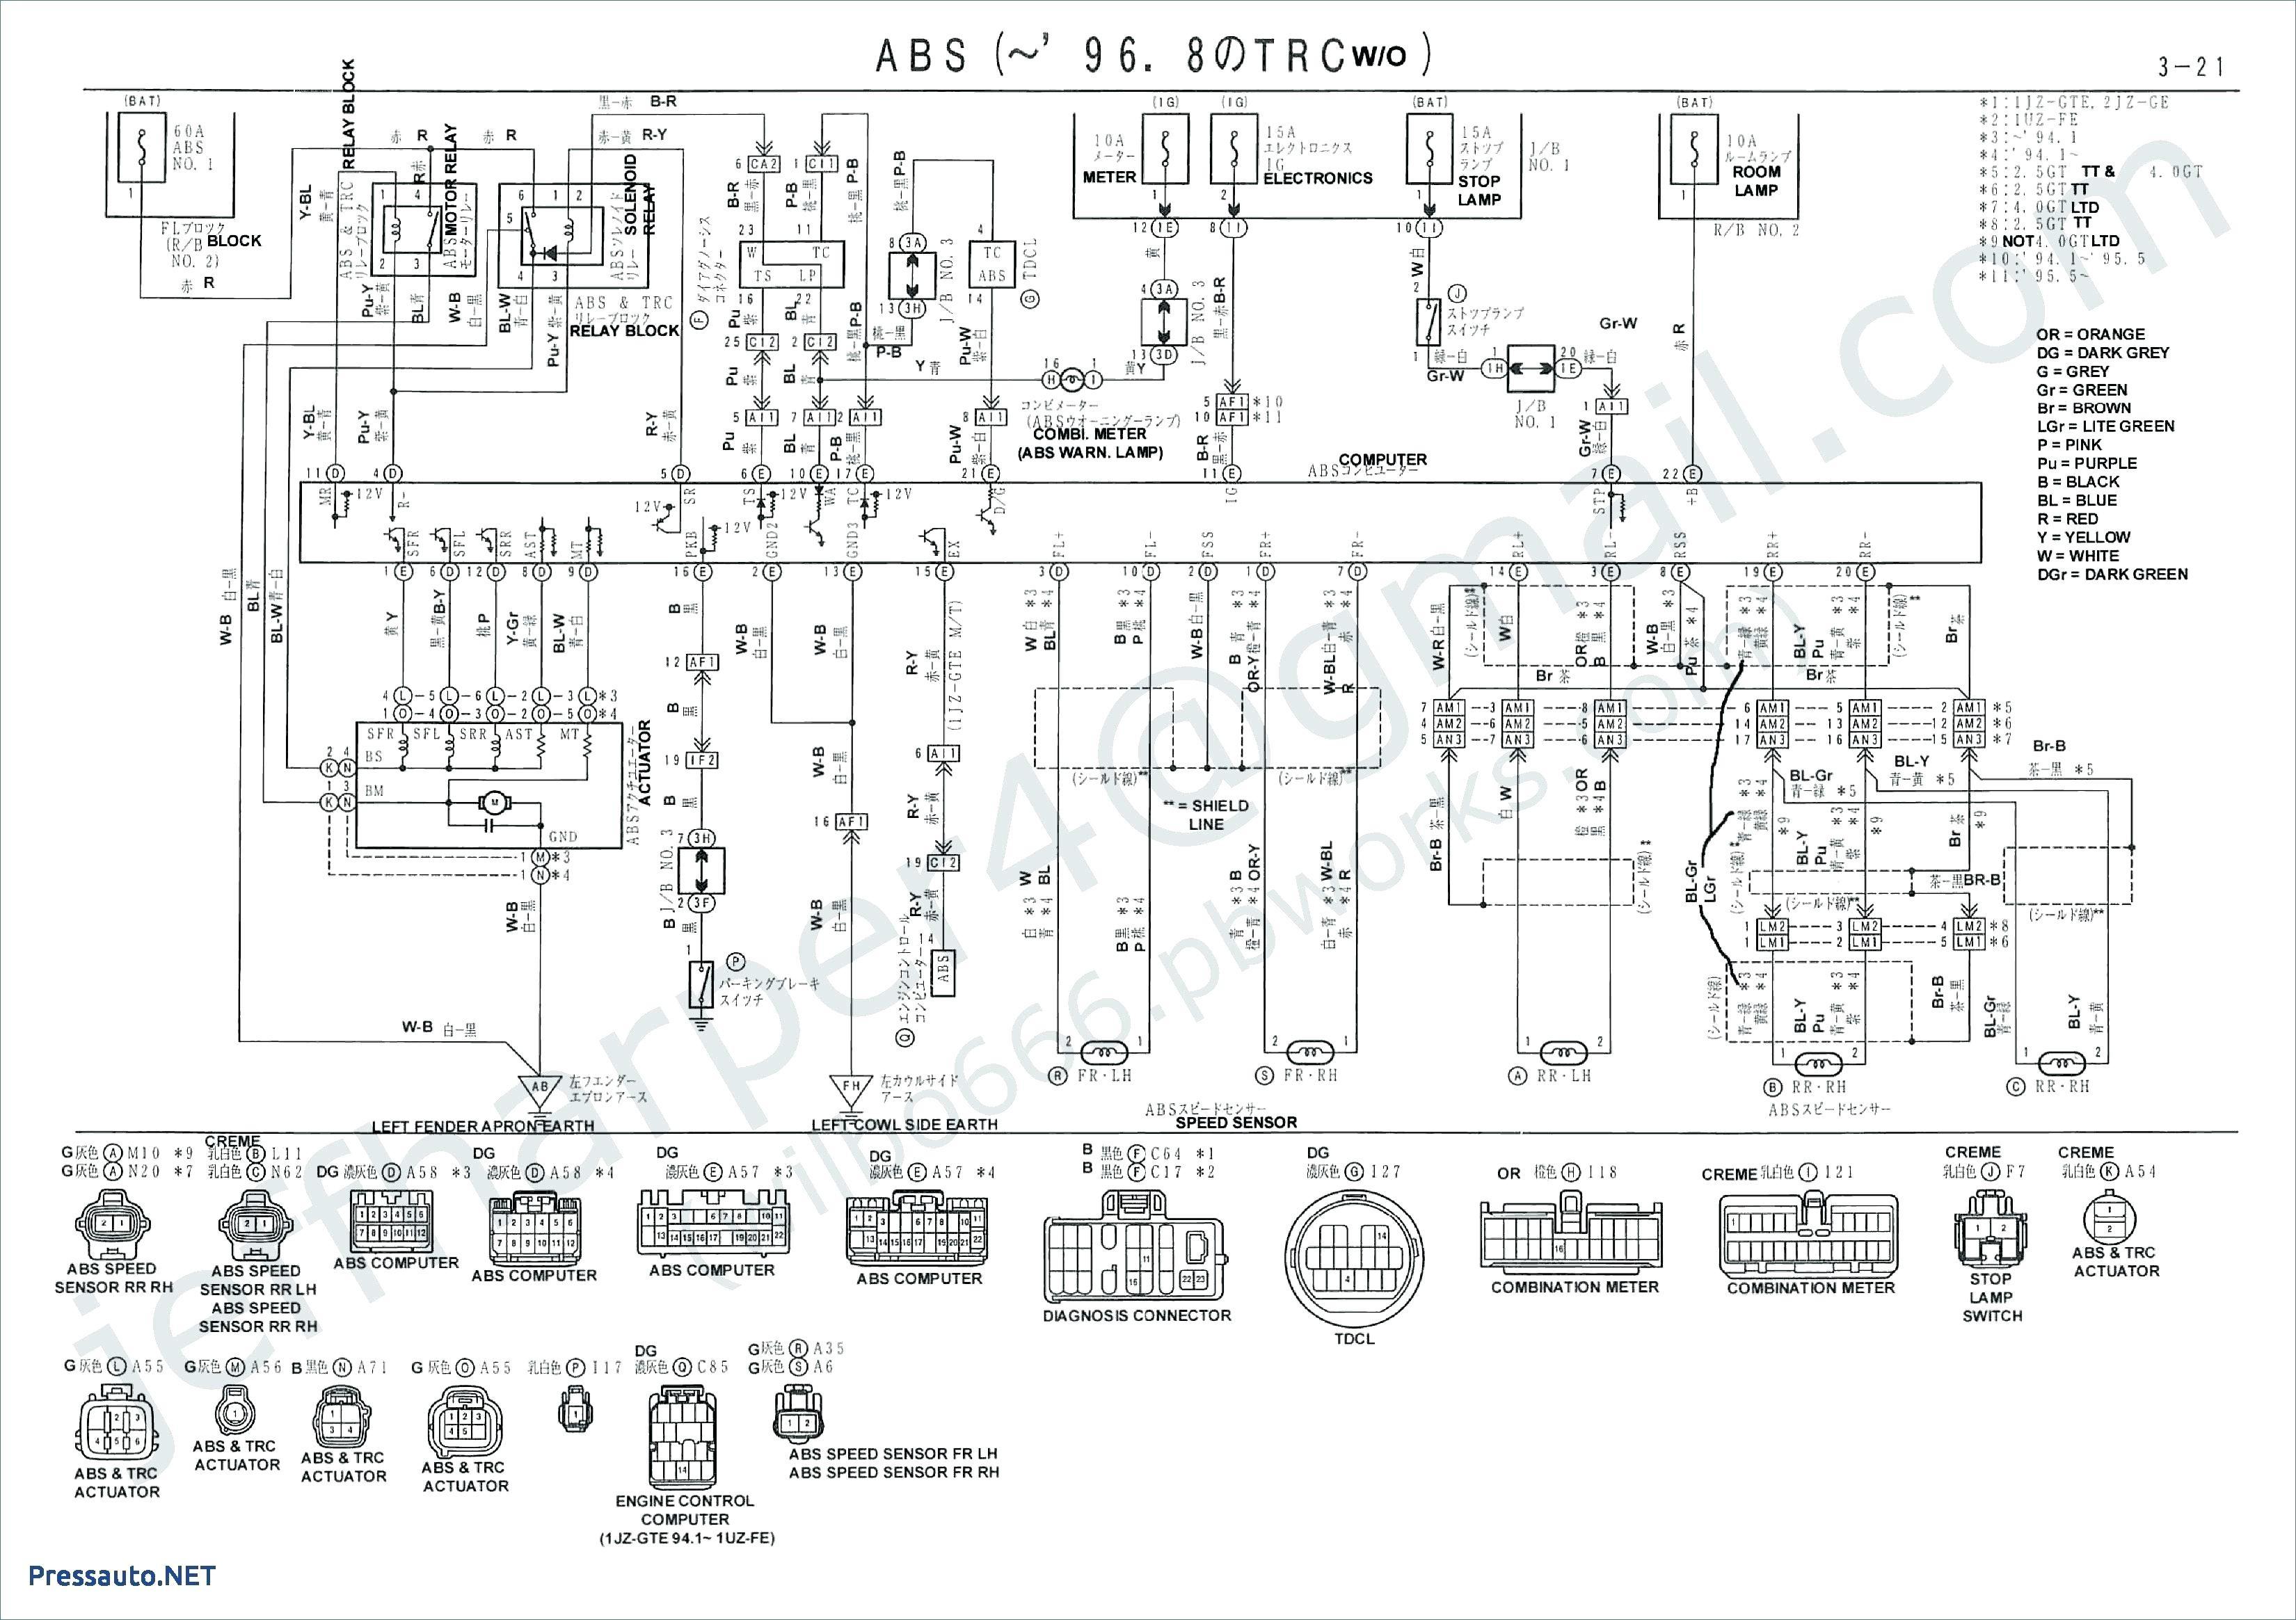 Dodge Stratus Wiring Diagram 2006 Dodge Ram 3500 Trailer Wiring Diagram  Pretty How to Wire Brake